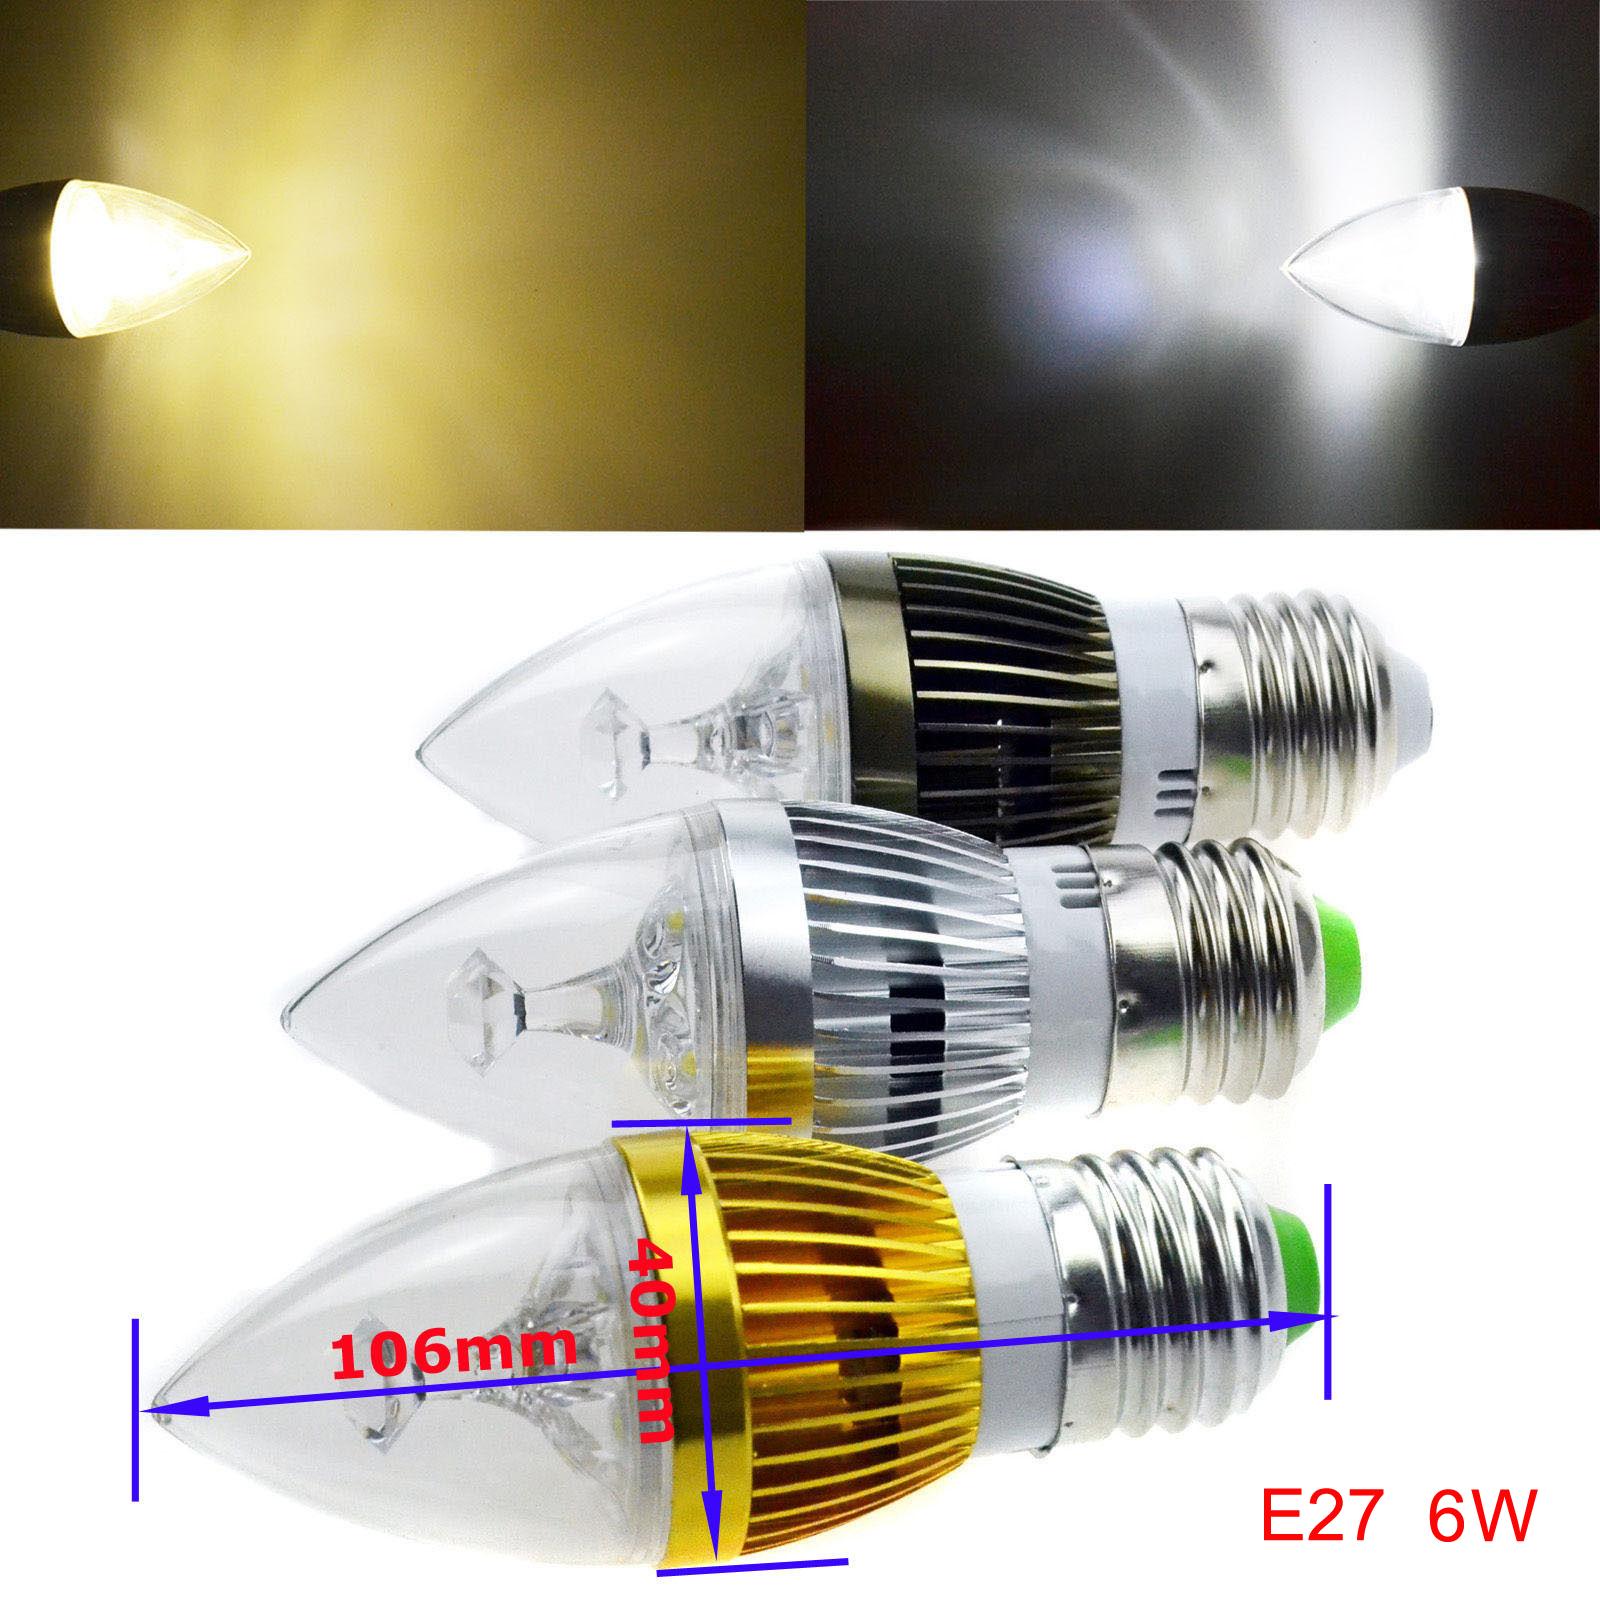 7caddf28-de0d-4b22-9adb-225c250c3063 Spannende High Power Led E27 Dekorationen